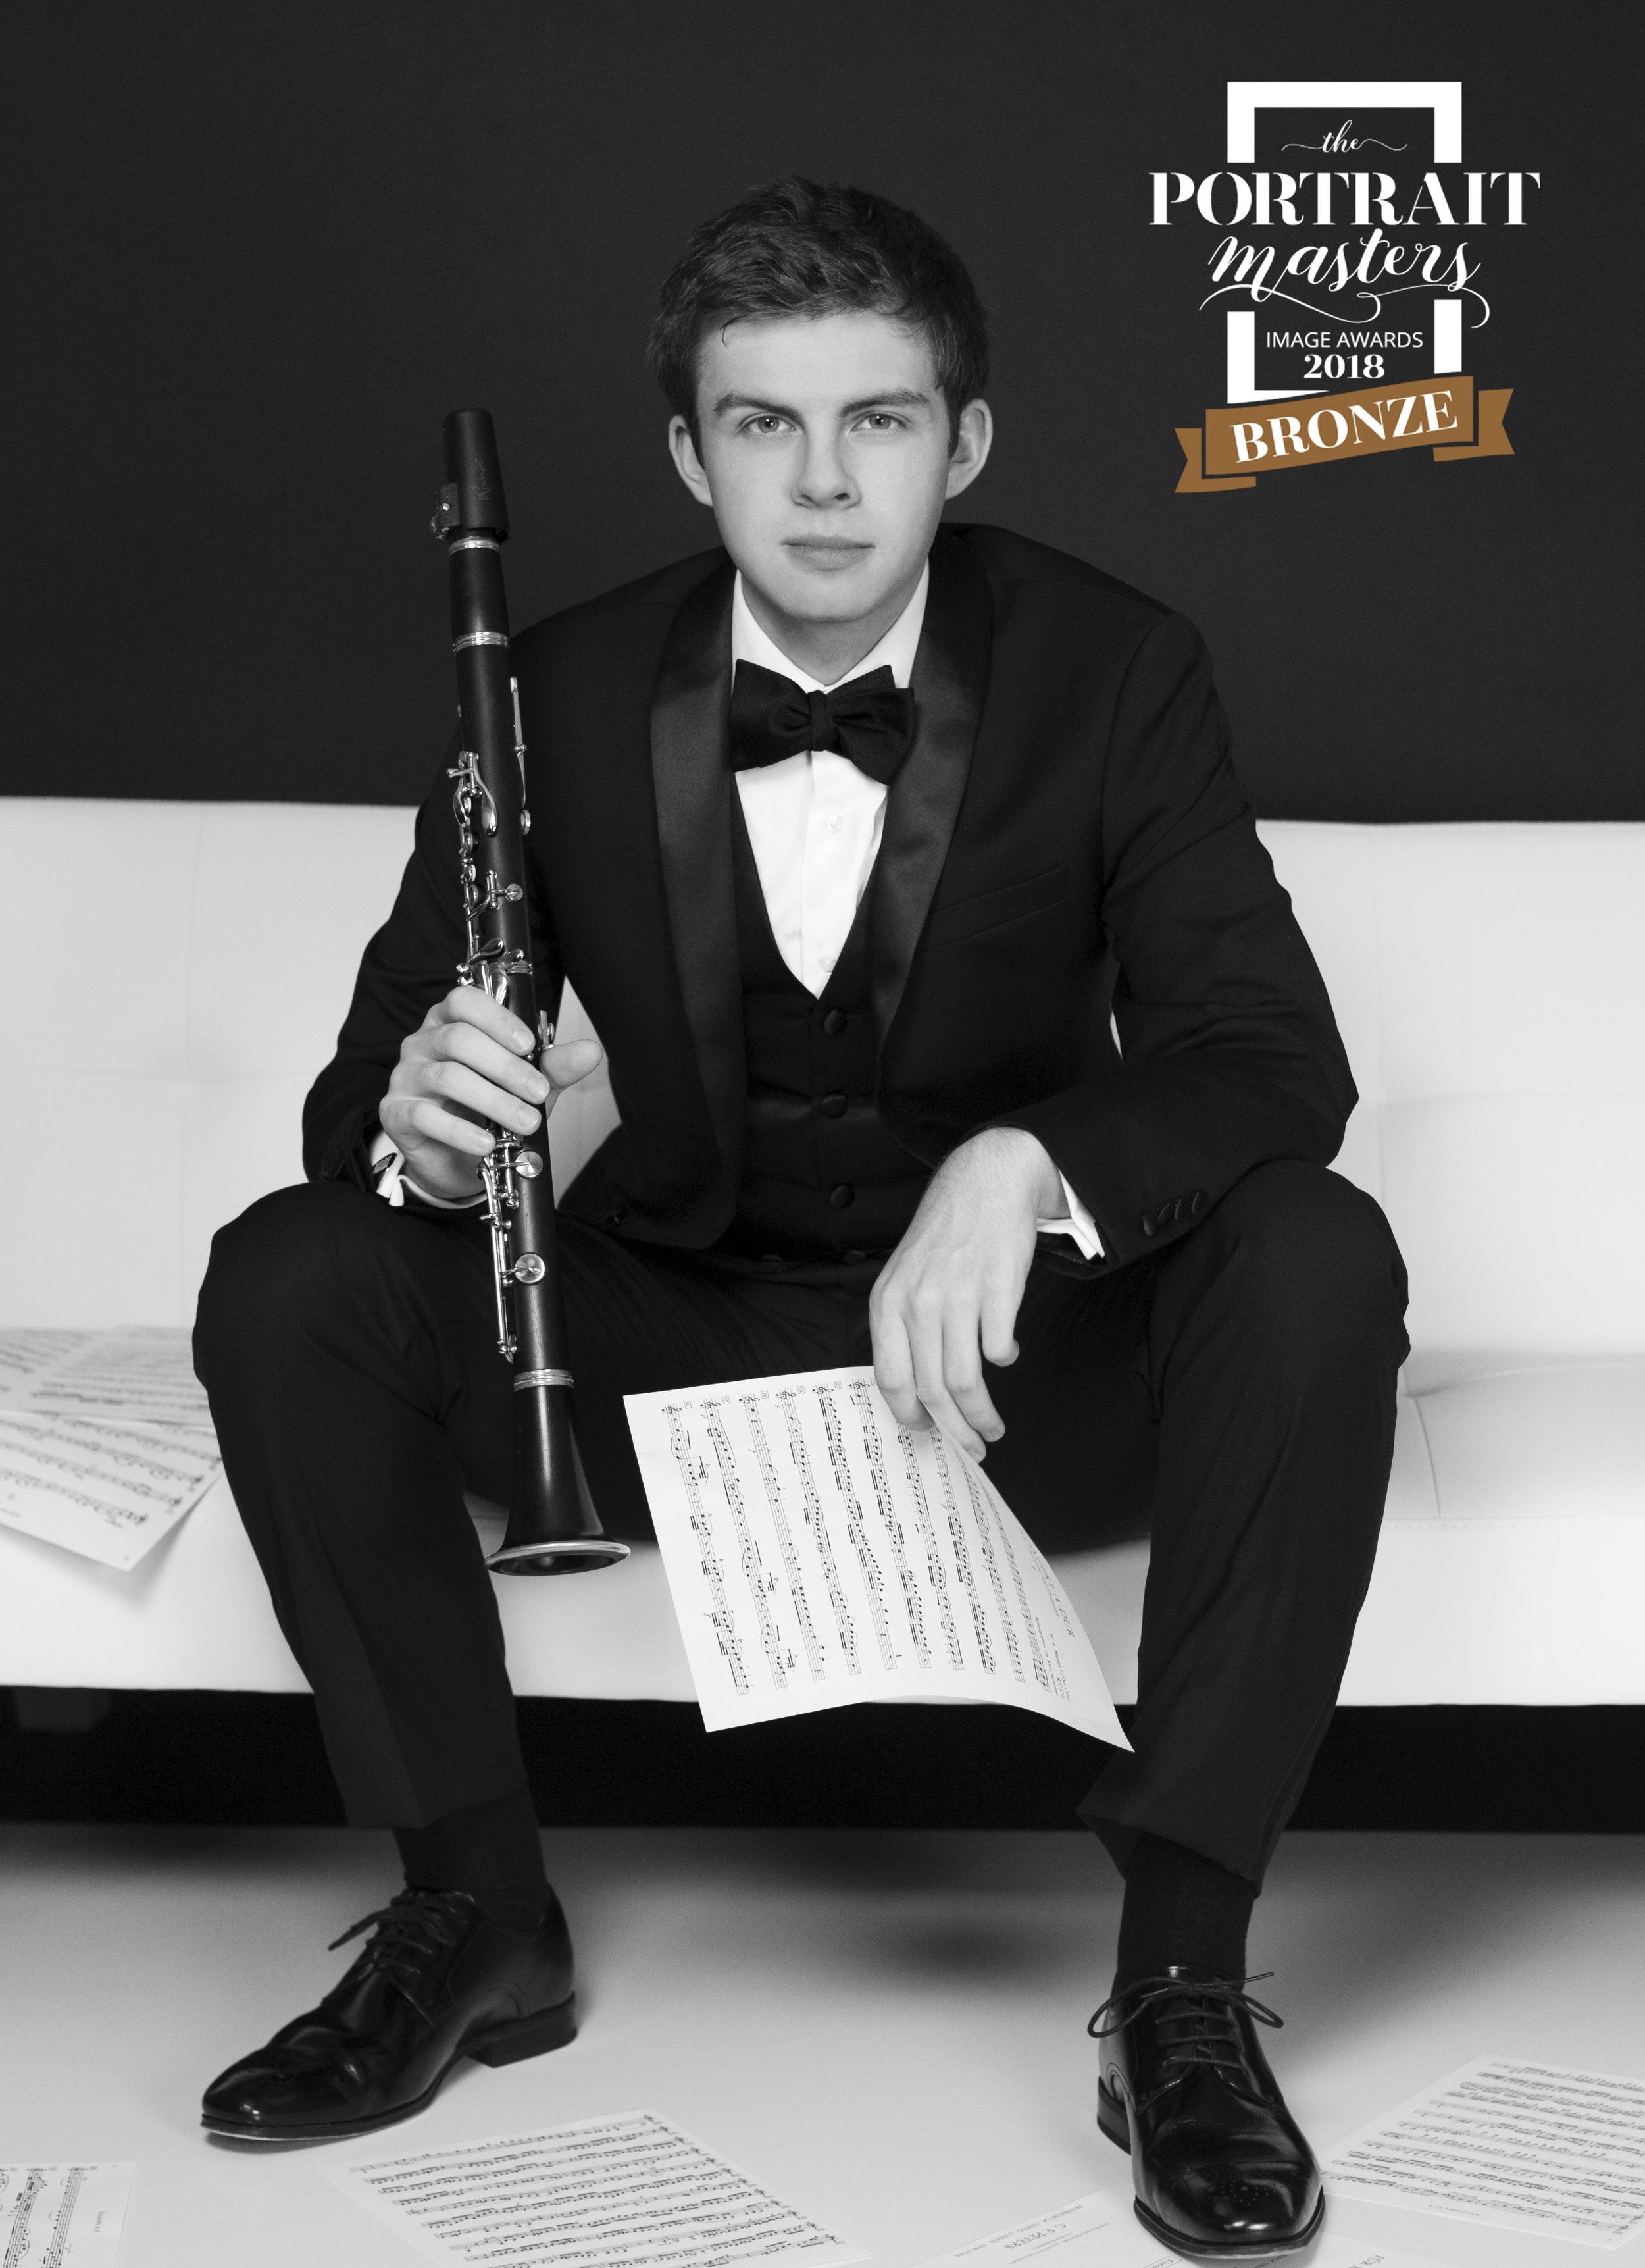 kathleen-barber-photography-fine-art-clarinet-musician.jpg